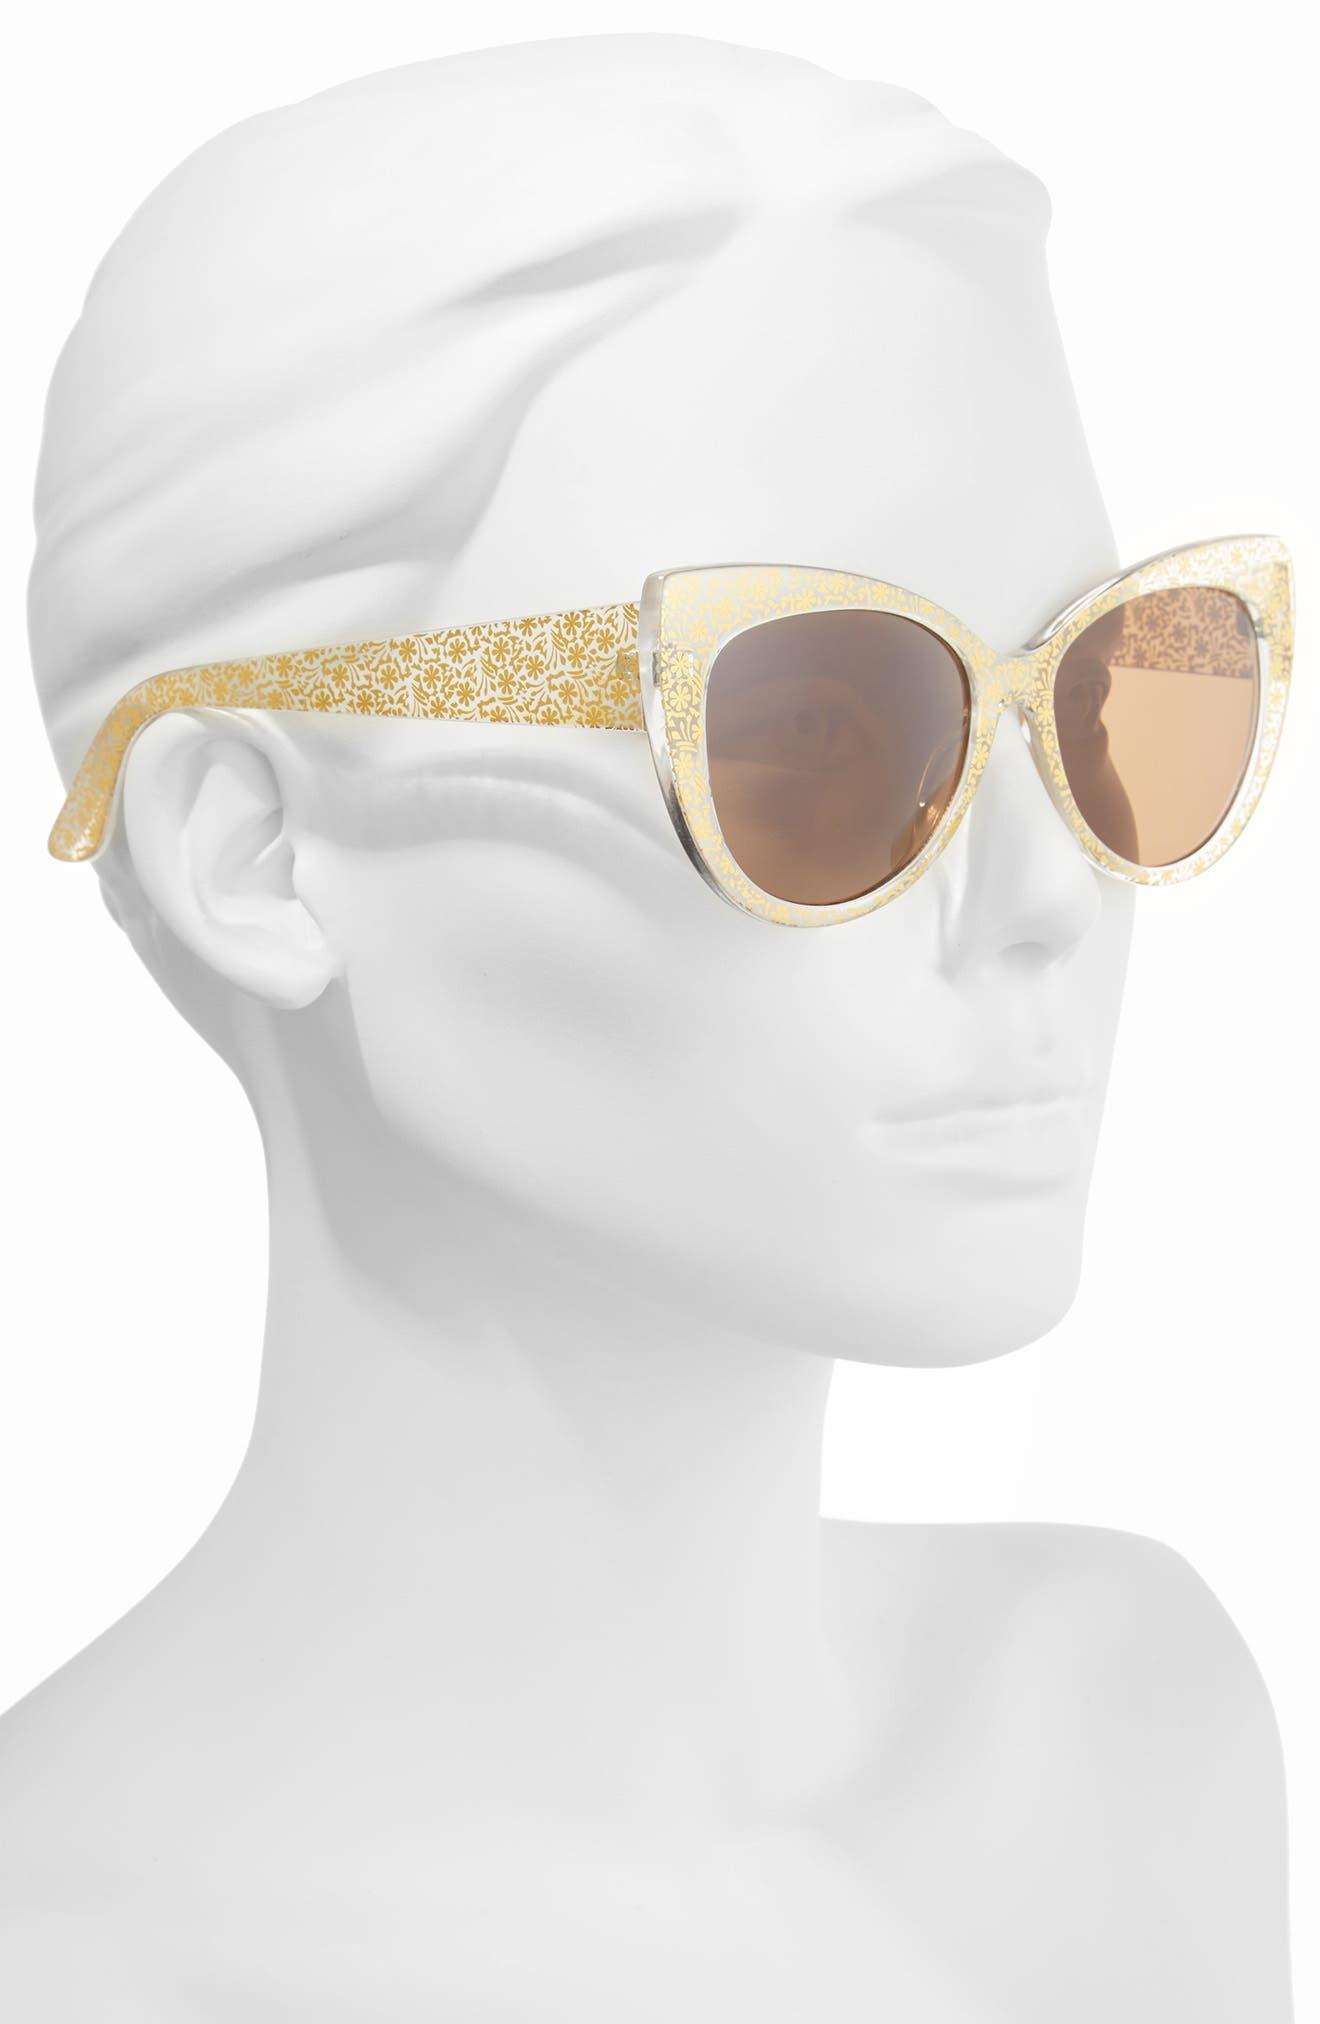 55mm Floral Cat Eye Sunglasses,                             Alternate thumbnail 4, color,